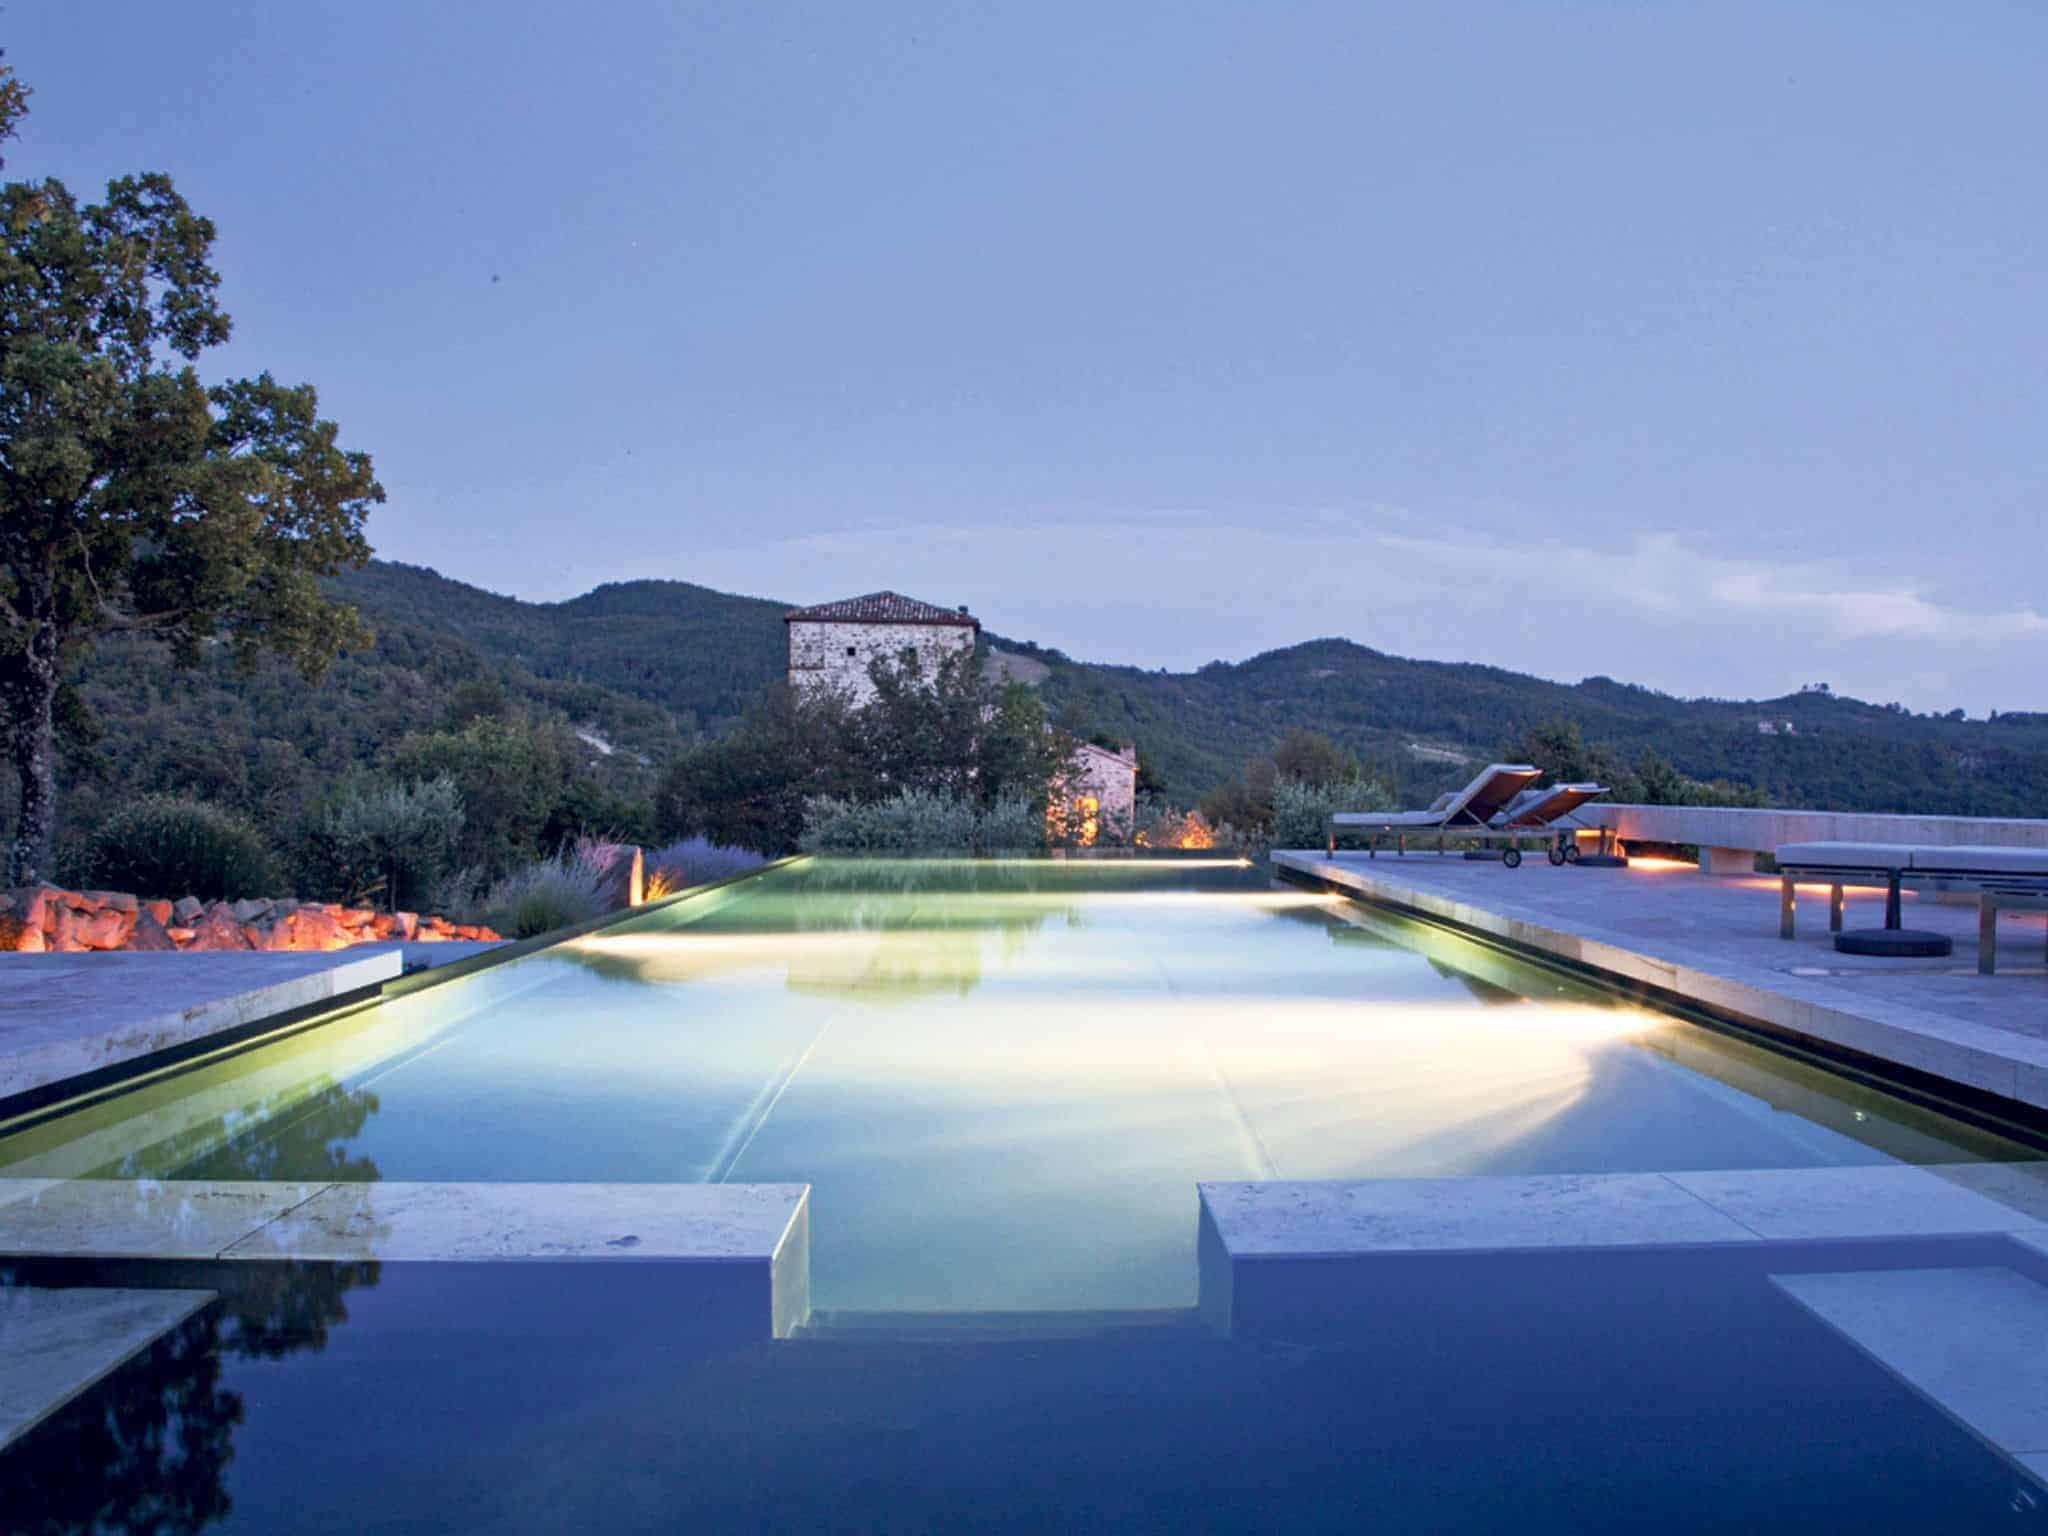 honeymoon top 10 romantic hotels Torre Di Moravola in Italy